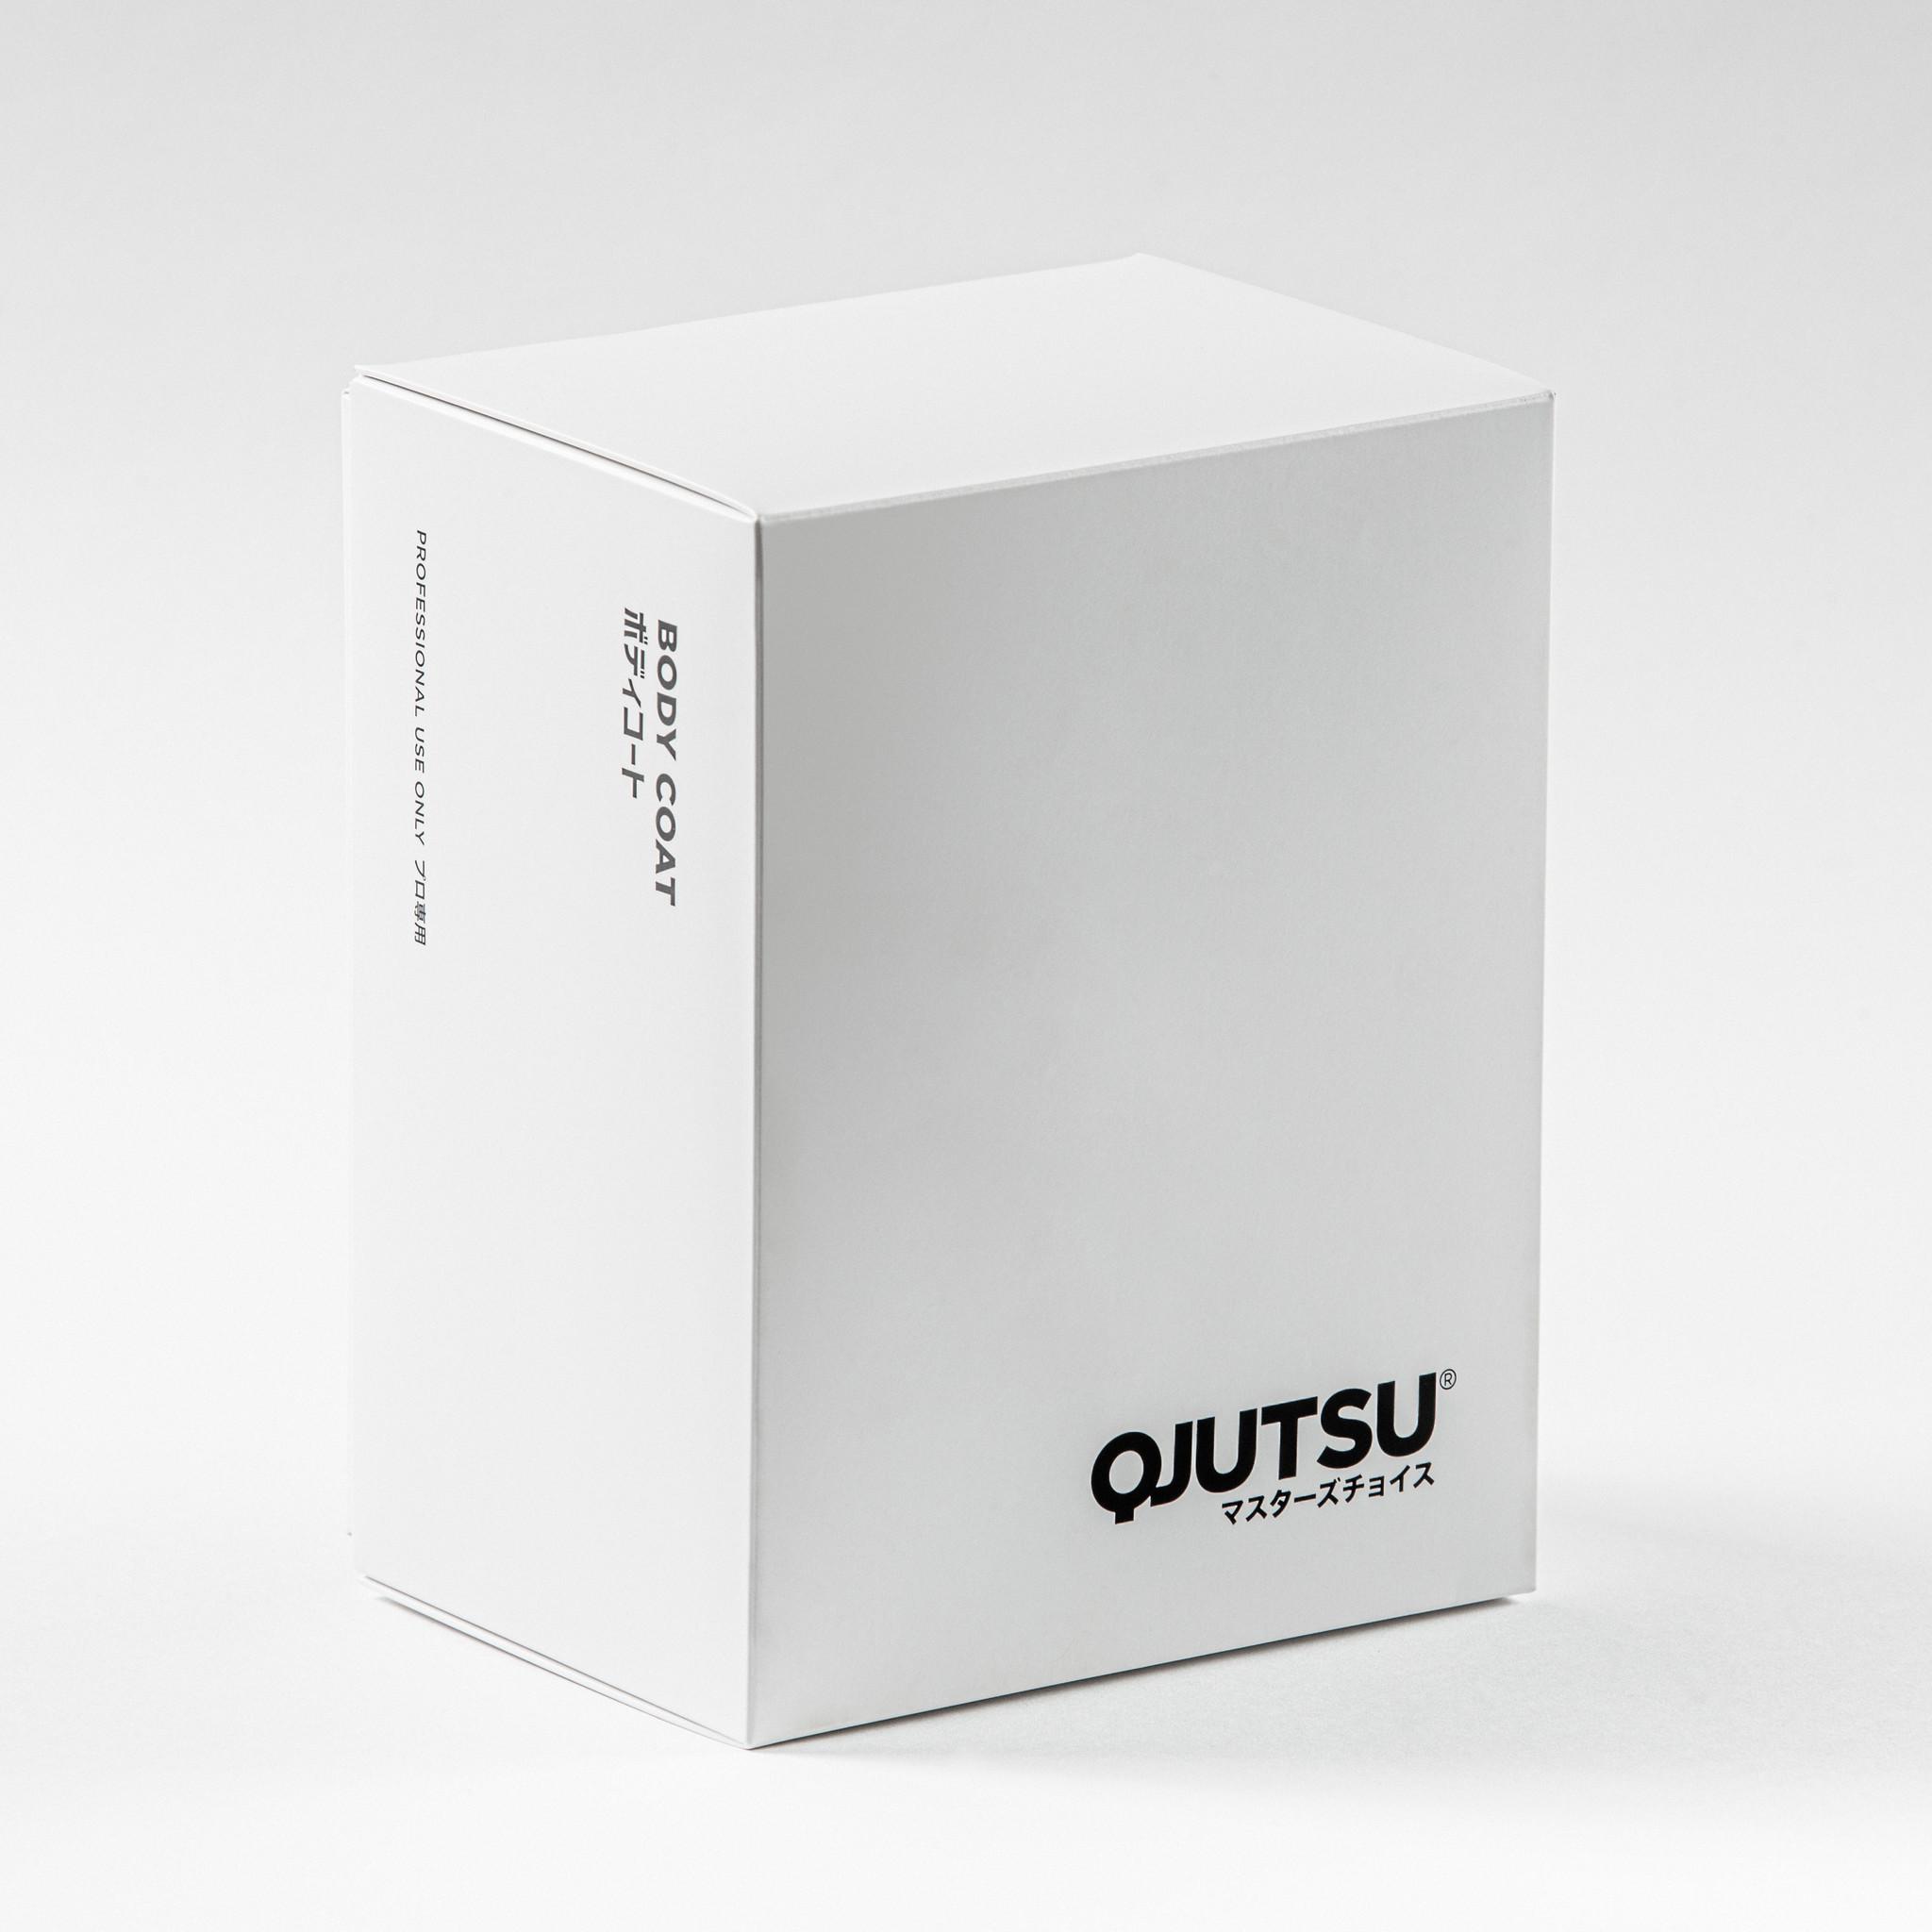 Soft99 Soft99 QJUTSU Body Coat 100ml